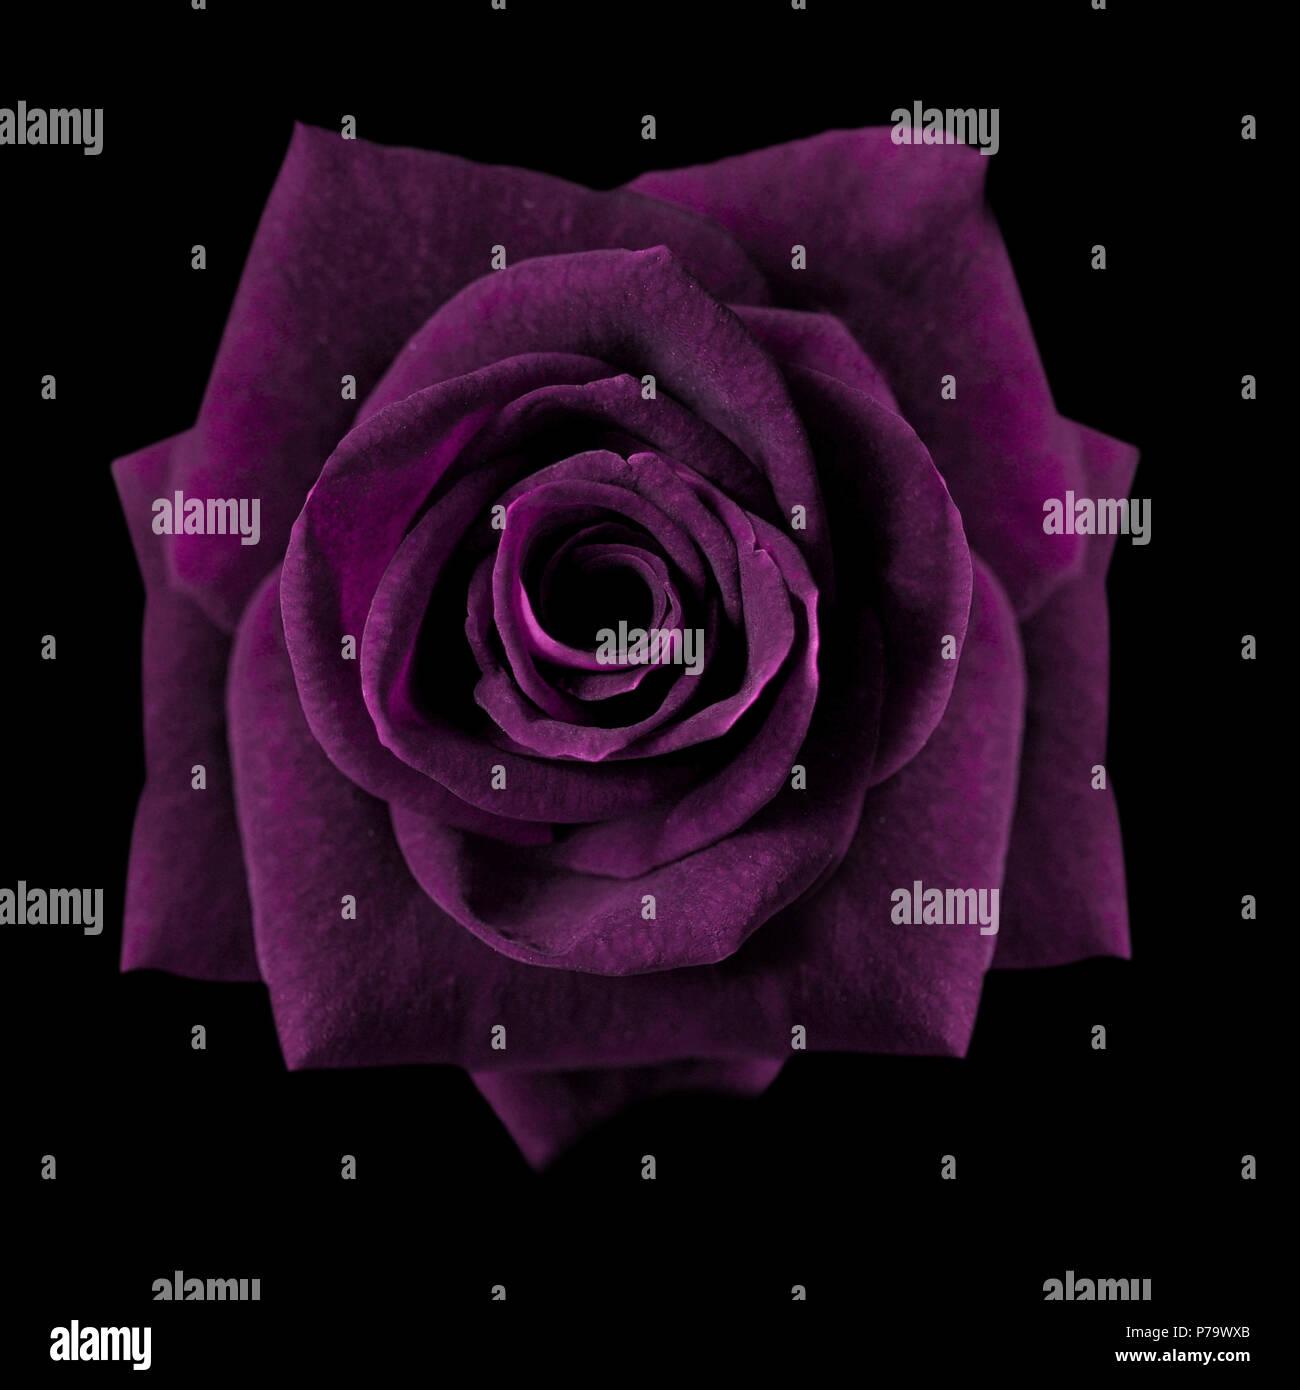 Dark purple roses background purple rose isolated on black dark purple roses background purple rose isolated on black background greeting card with a luxury roses image dark tone m4hsunfo